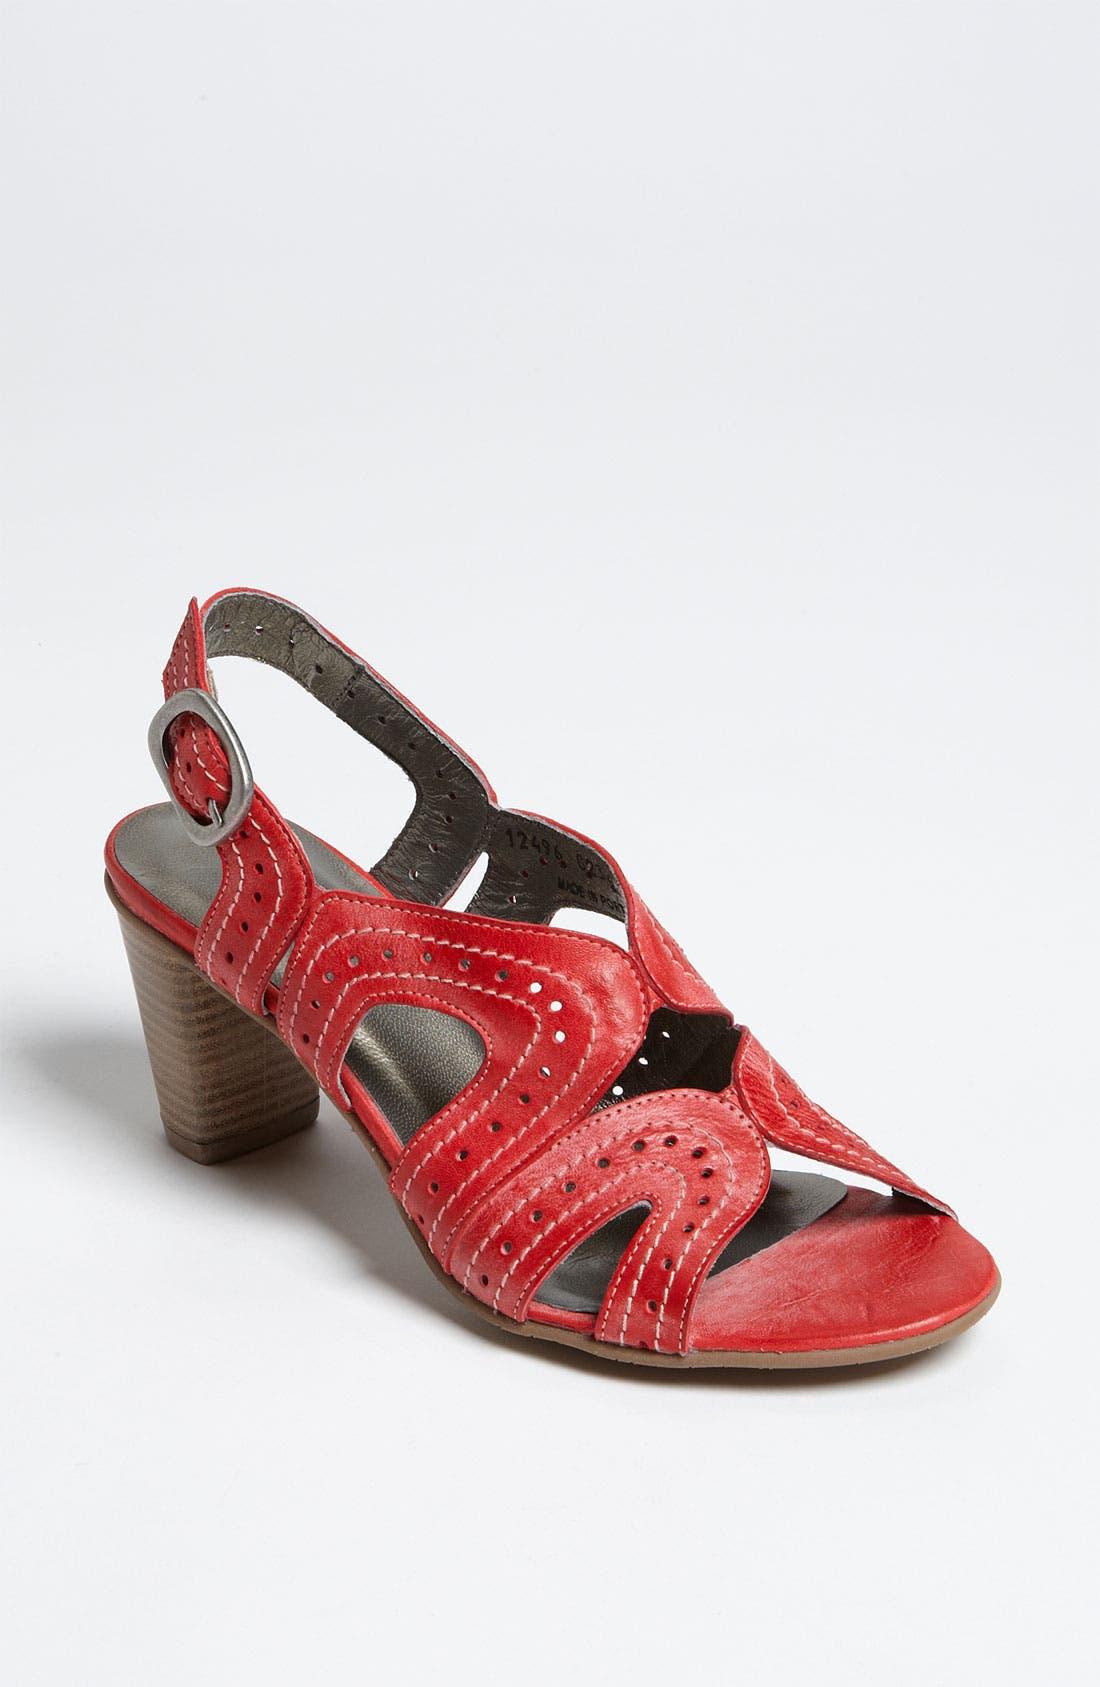 Main Image - Fidji 'Brooke' Sandal